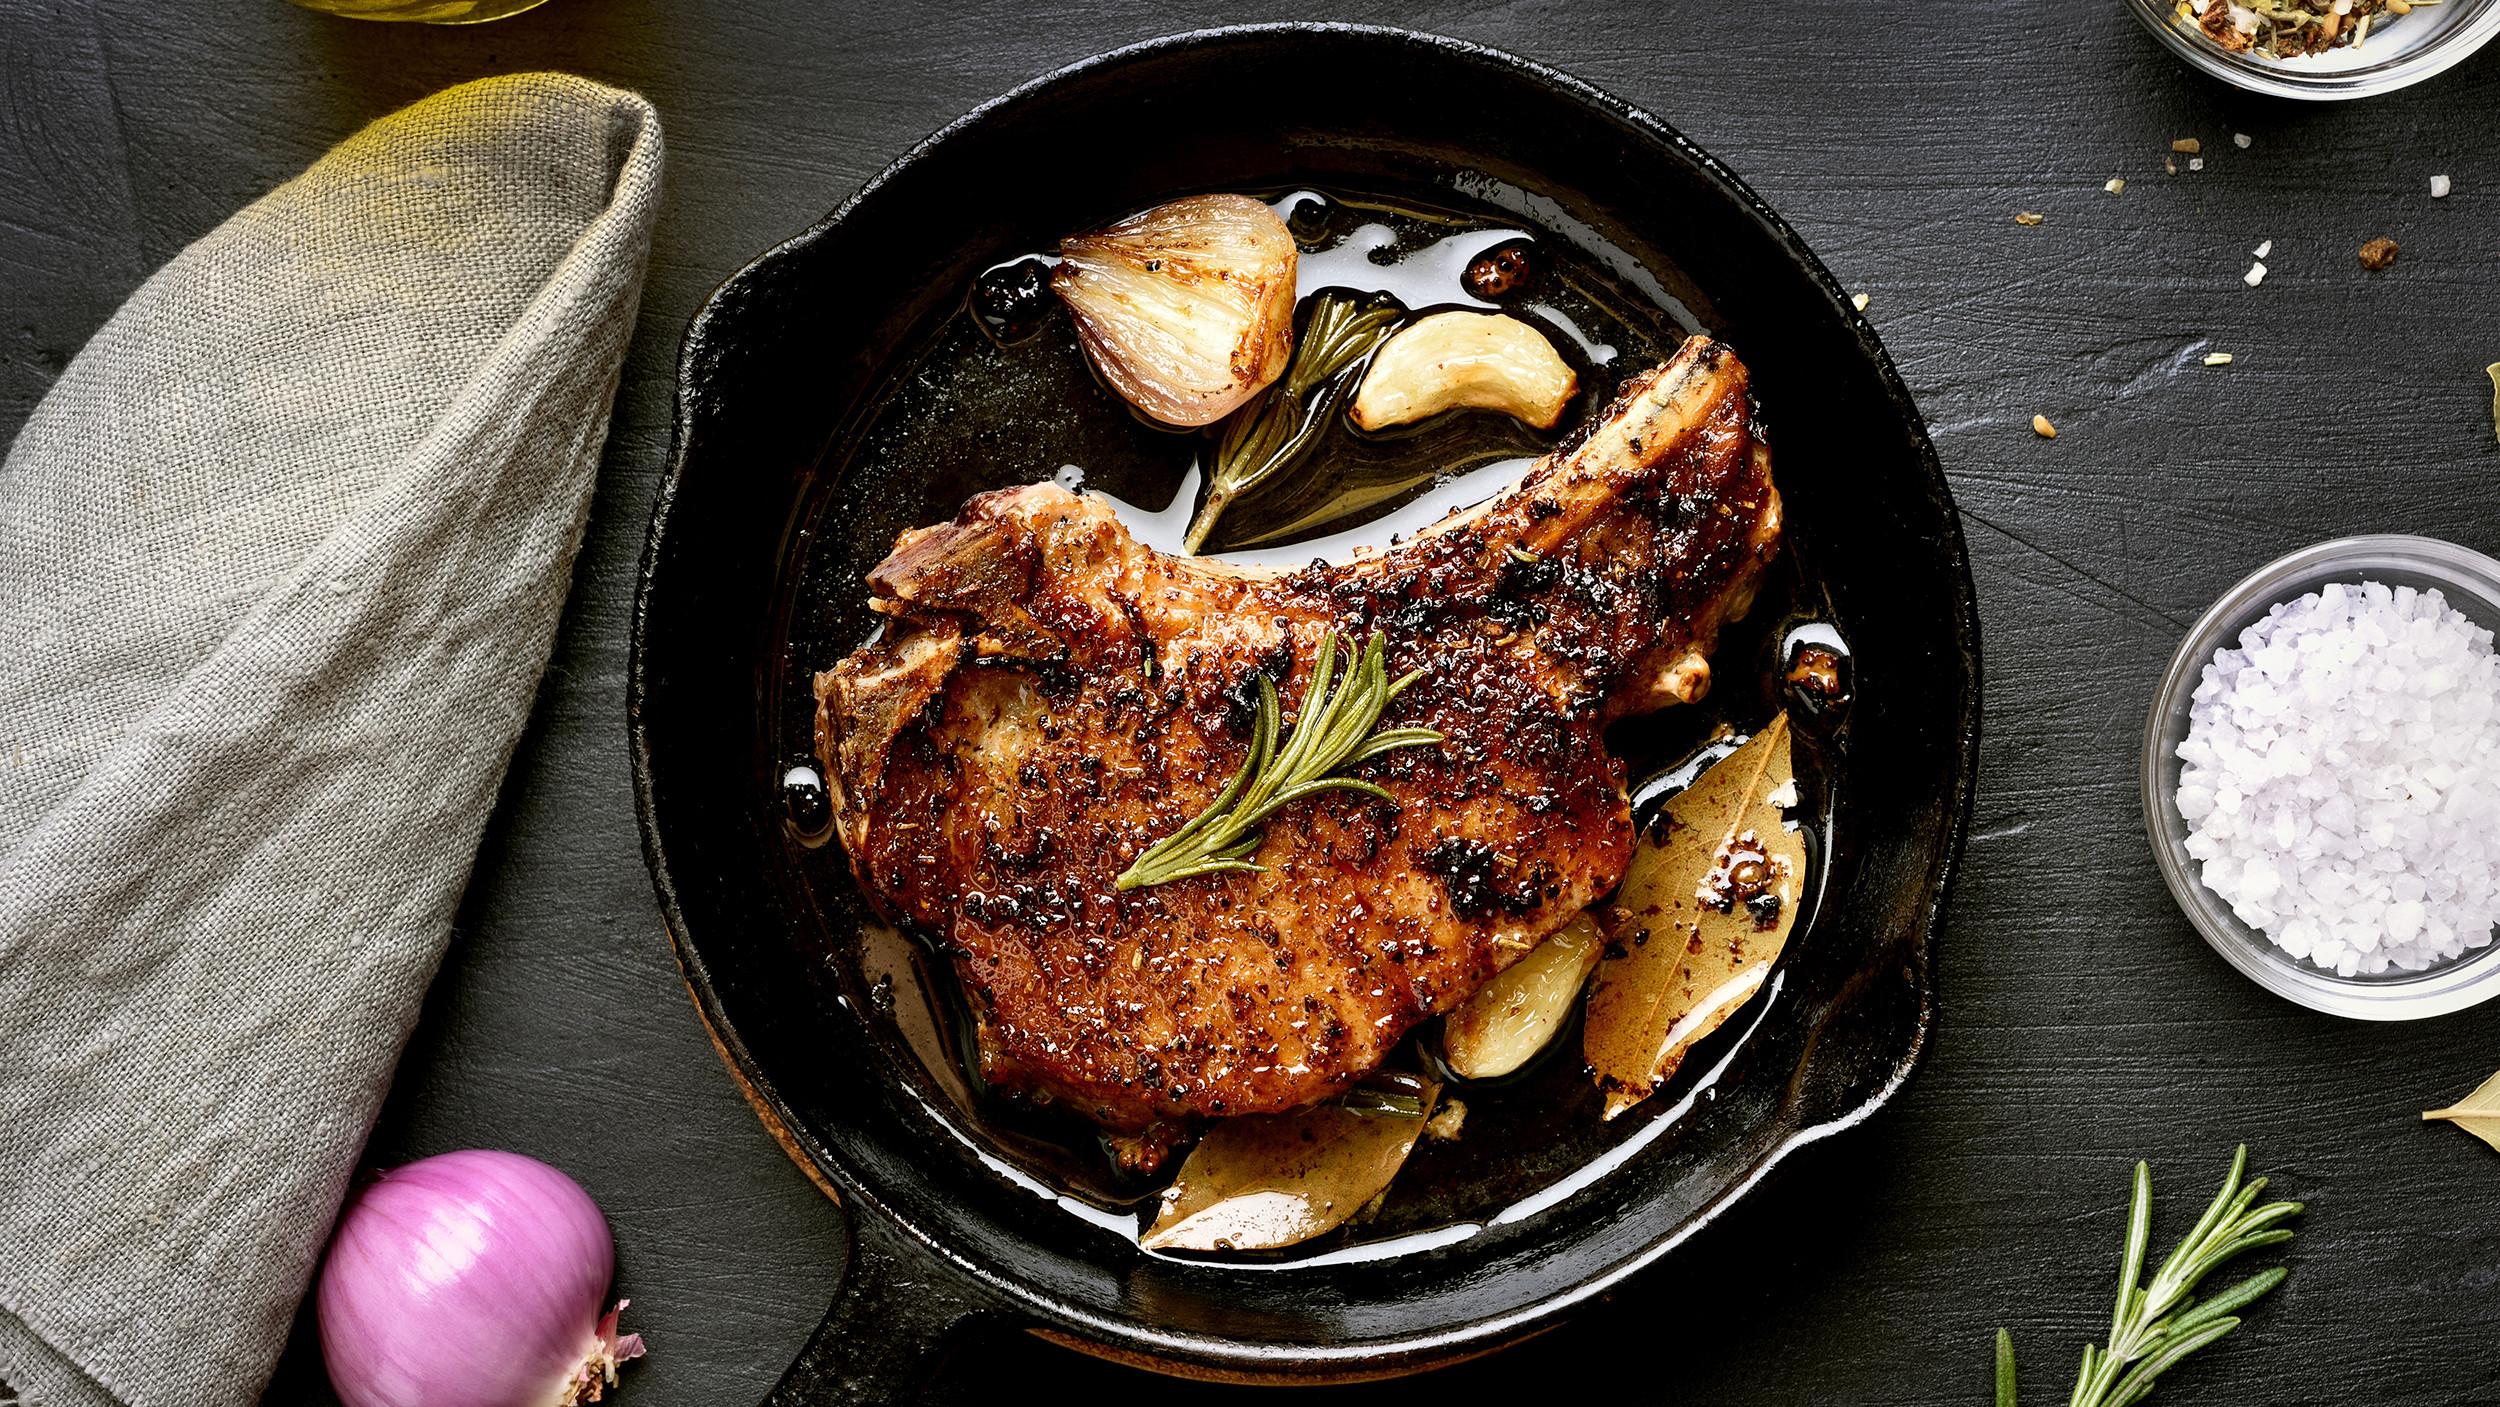 Ways To Cook Pork Chops  How cook pork chops The best way to make juicy pork chops